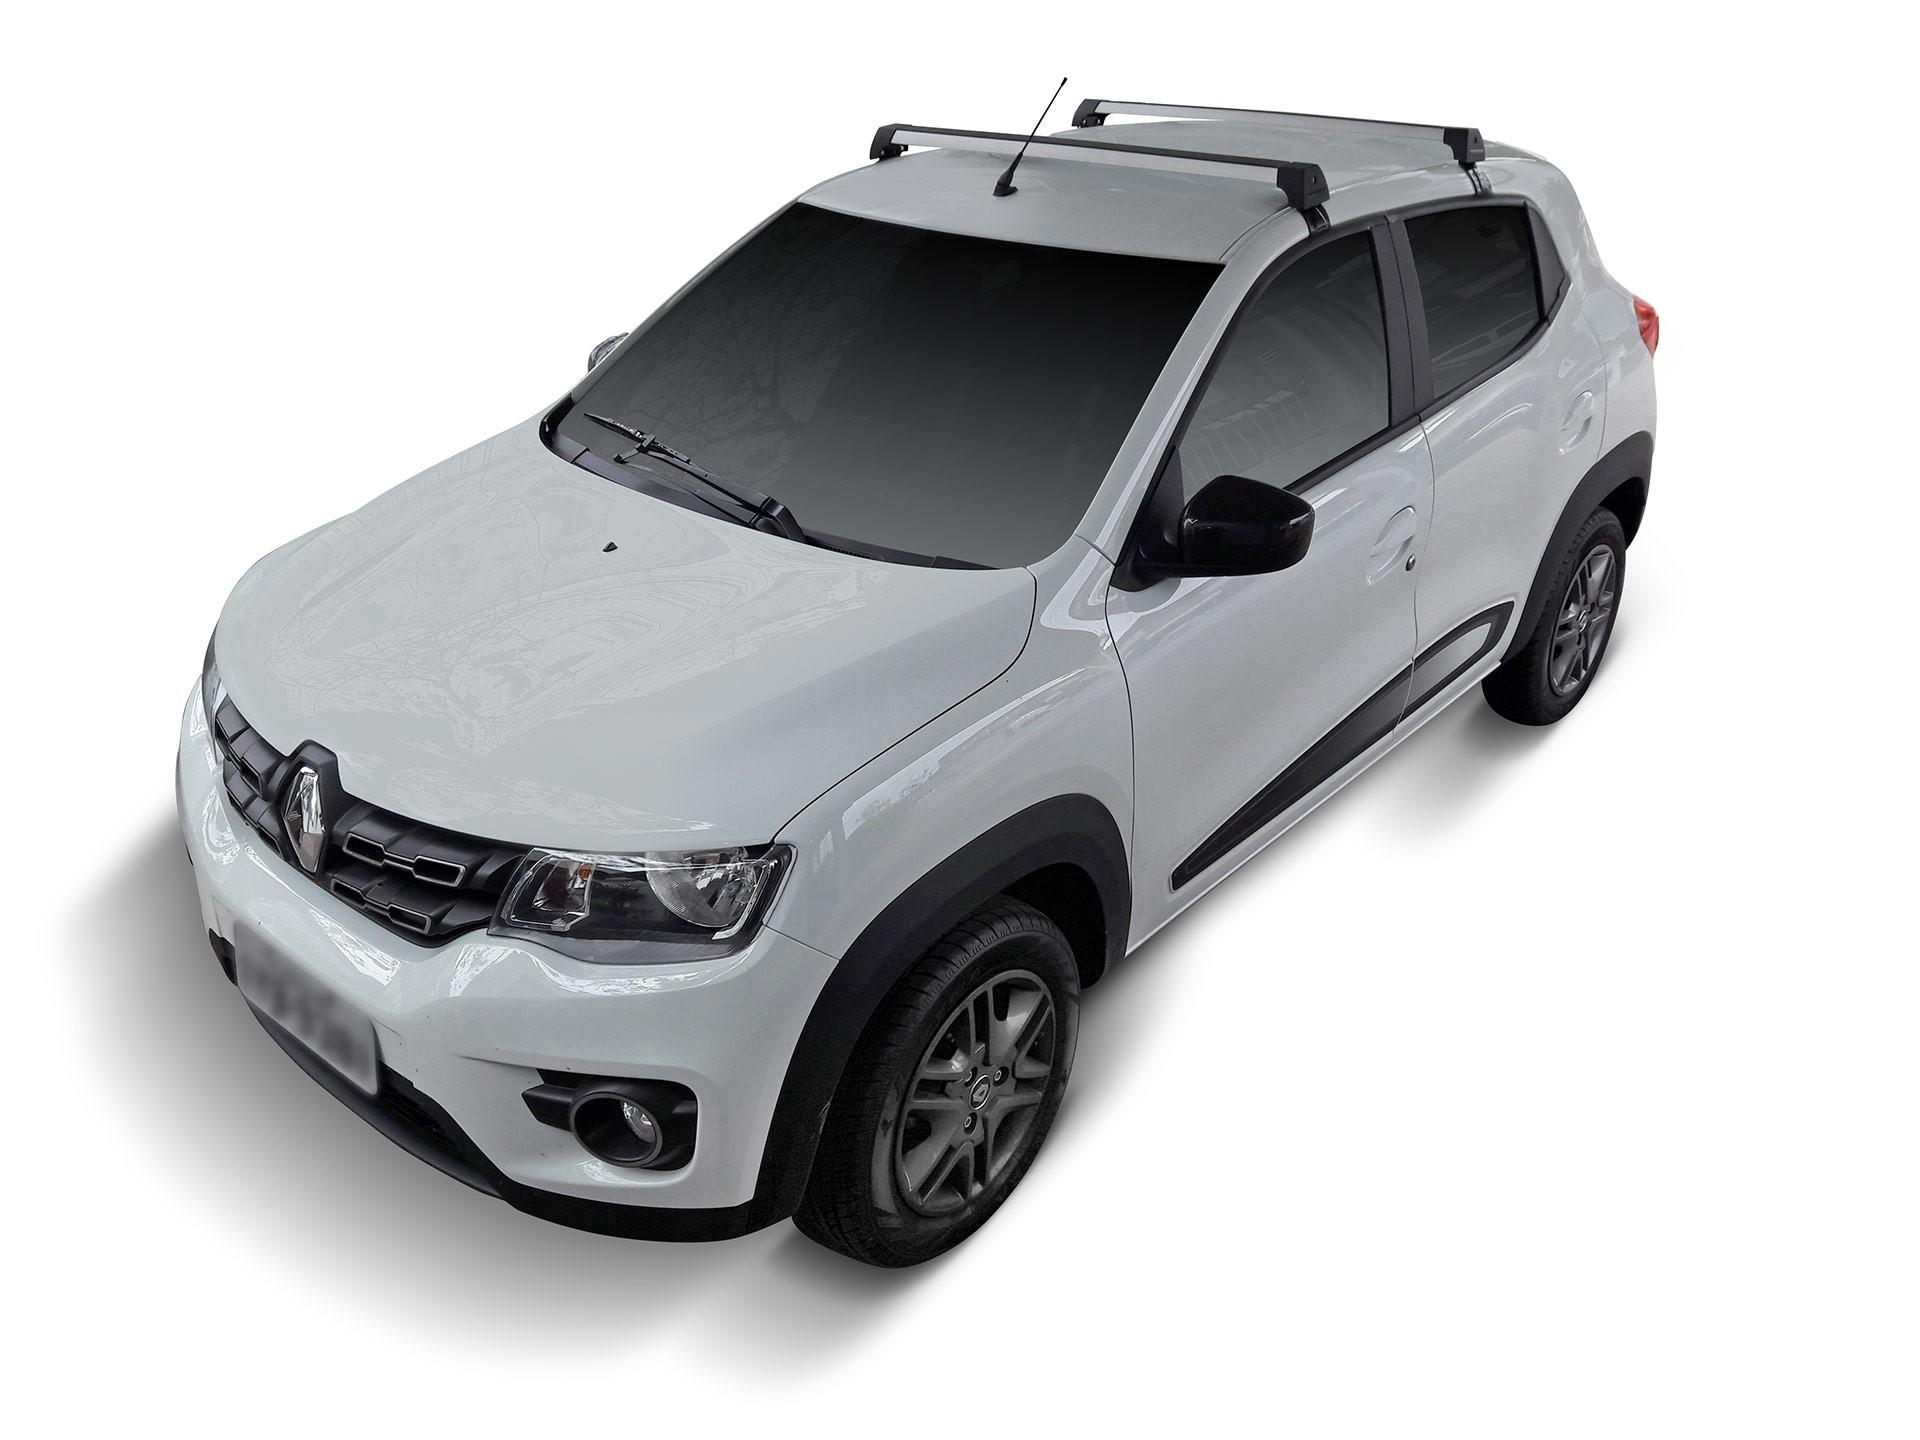 Rack Teto Travessa Renault Kwid Longlife Sports Aluminio